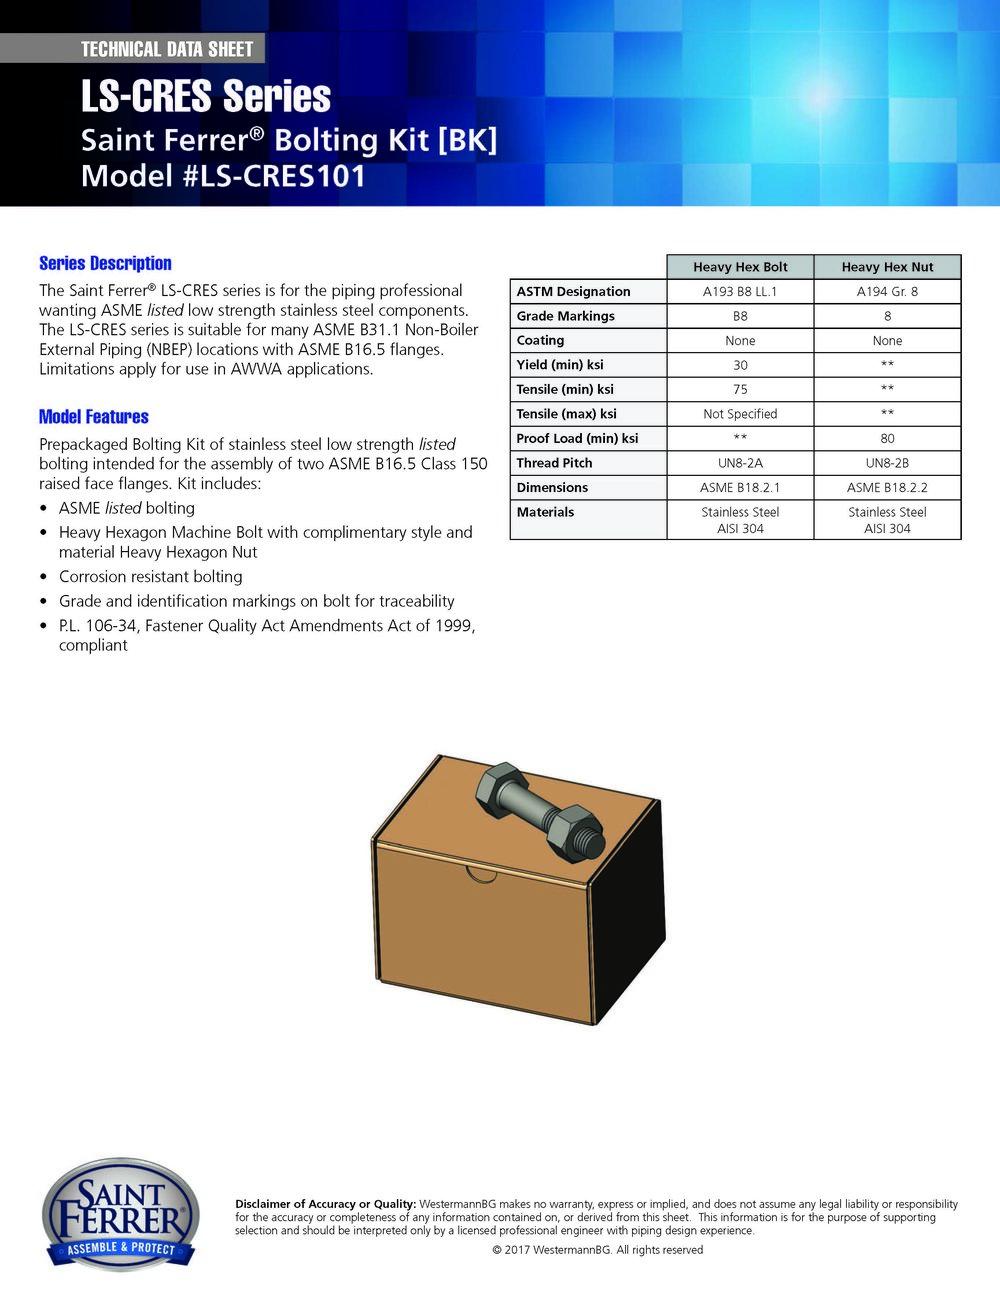 SF_Data_Sheet_LS-CRES_Series_LS-CRES101.jpg